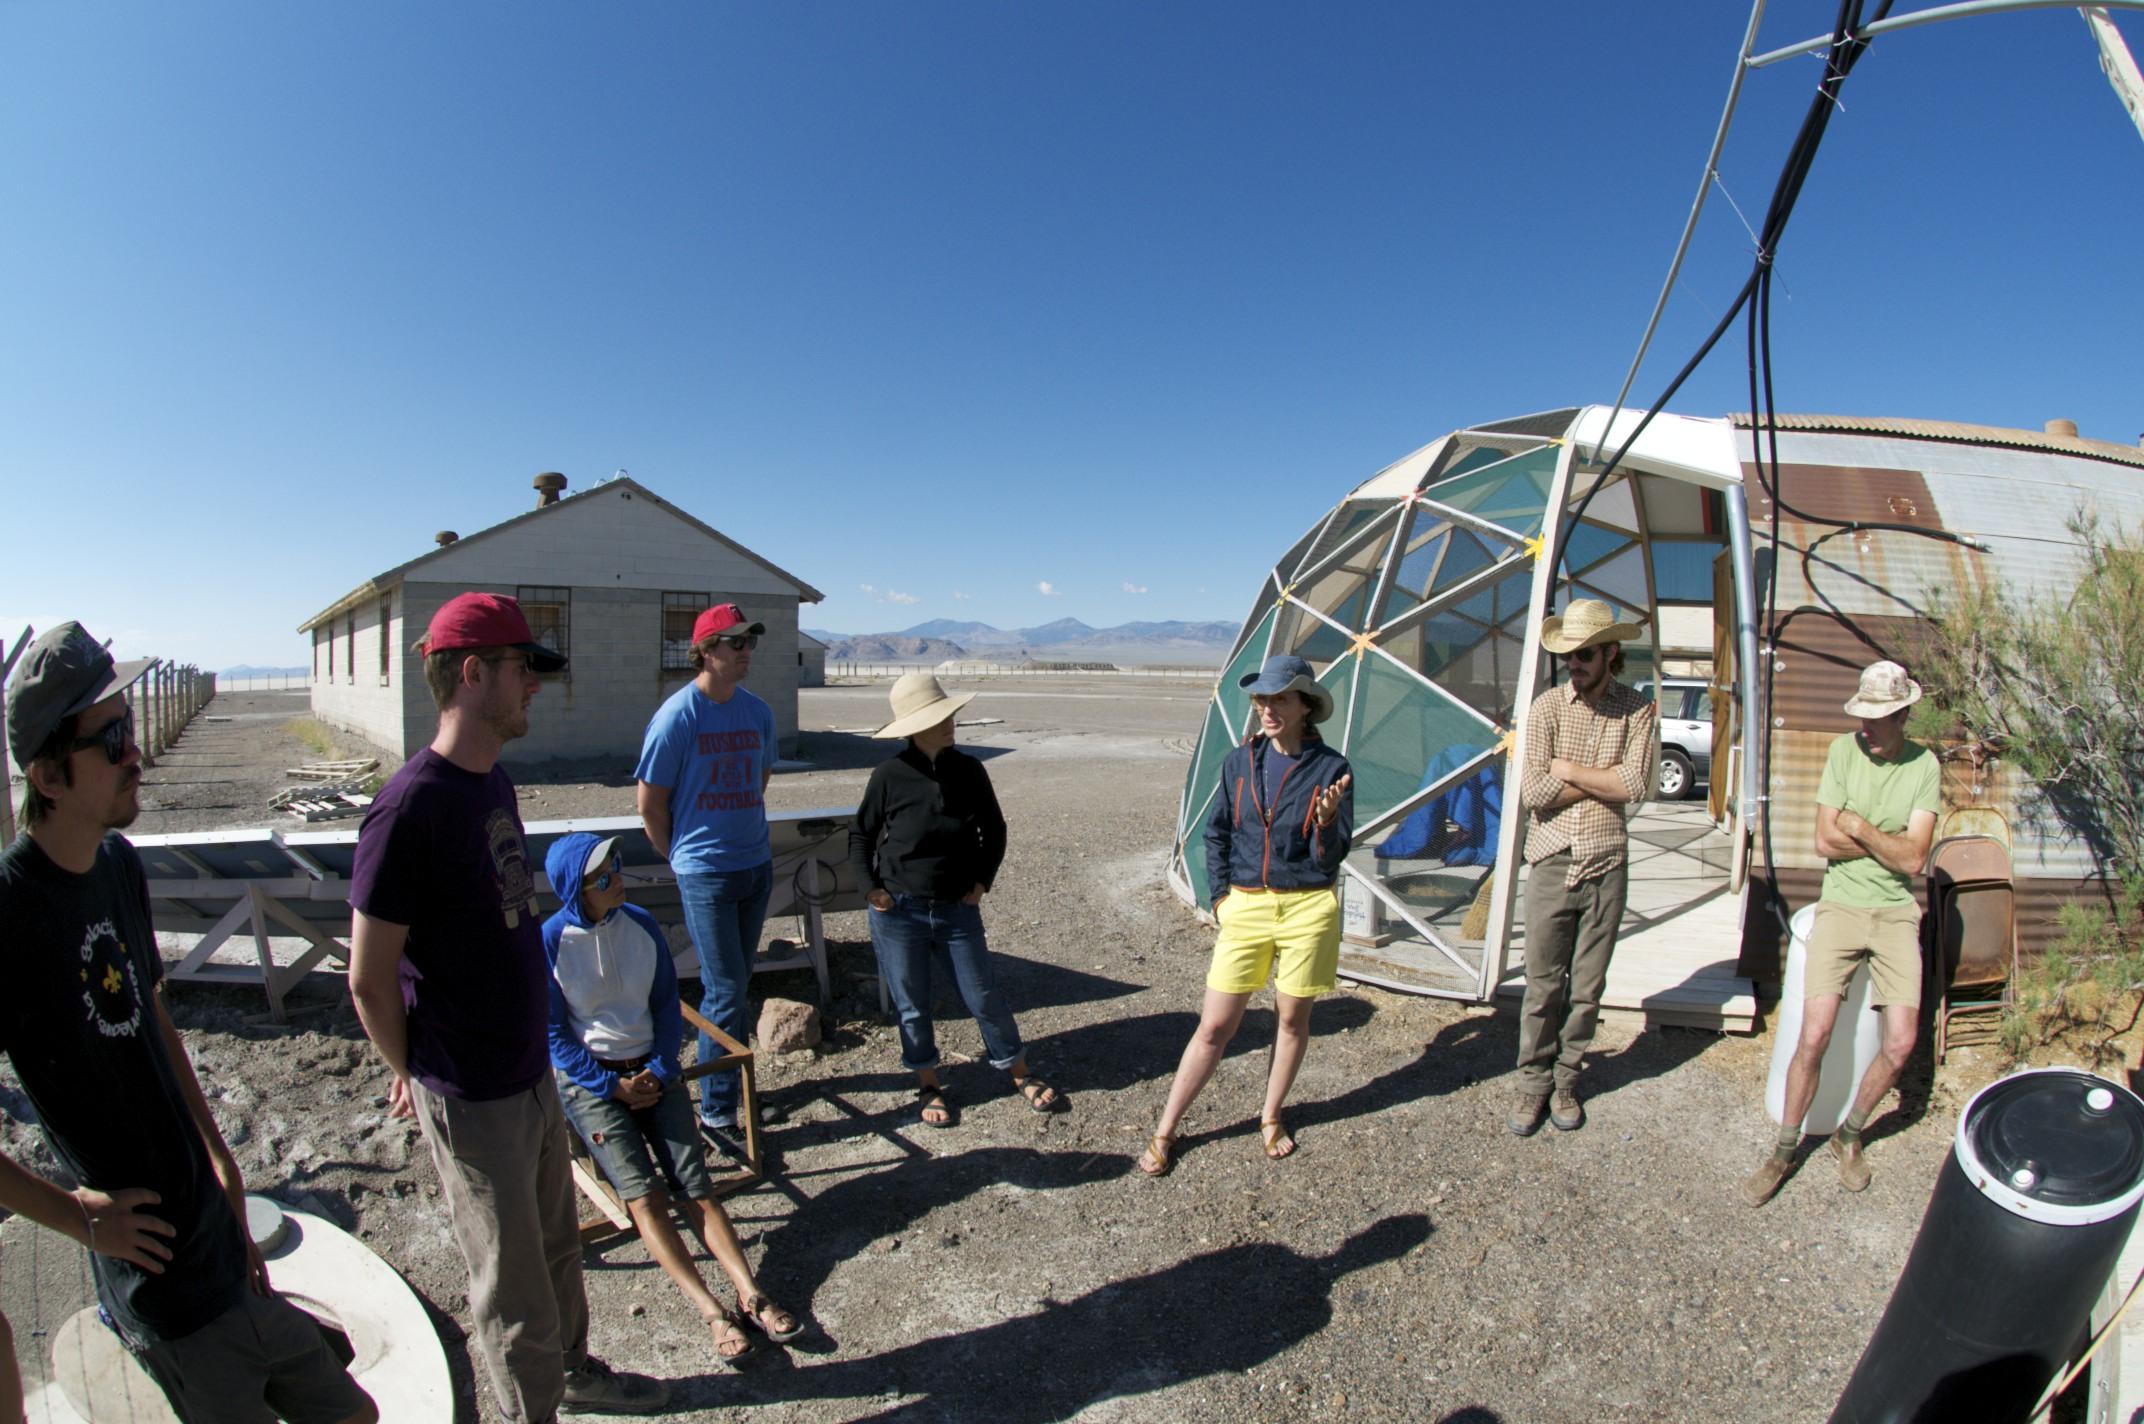 Deborah Stratman orienting South Base, Wendover, Utah.